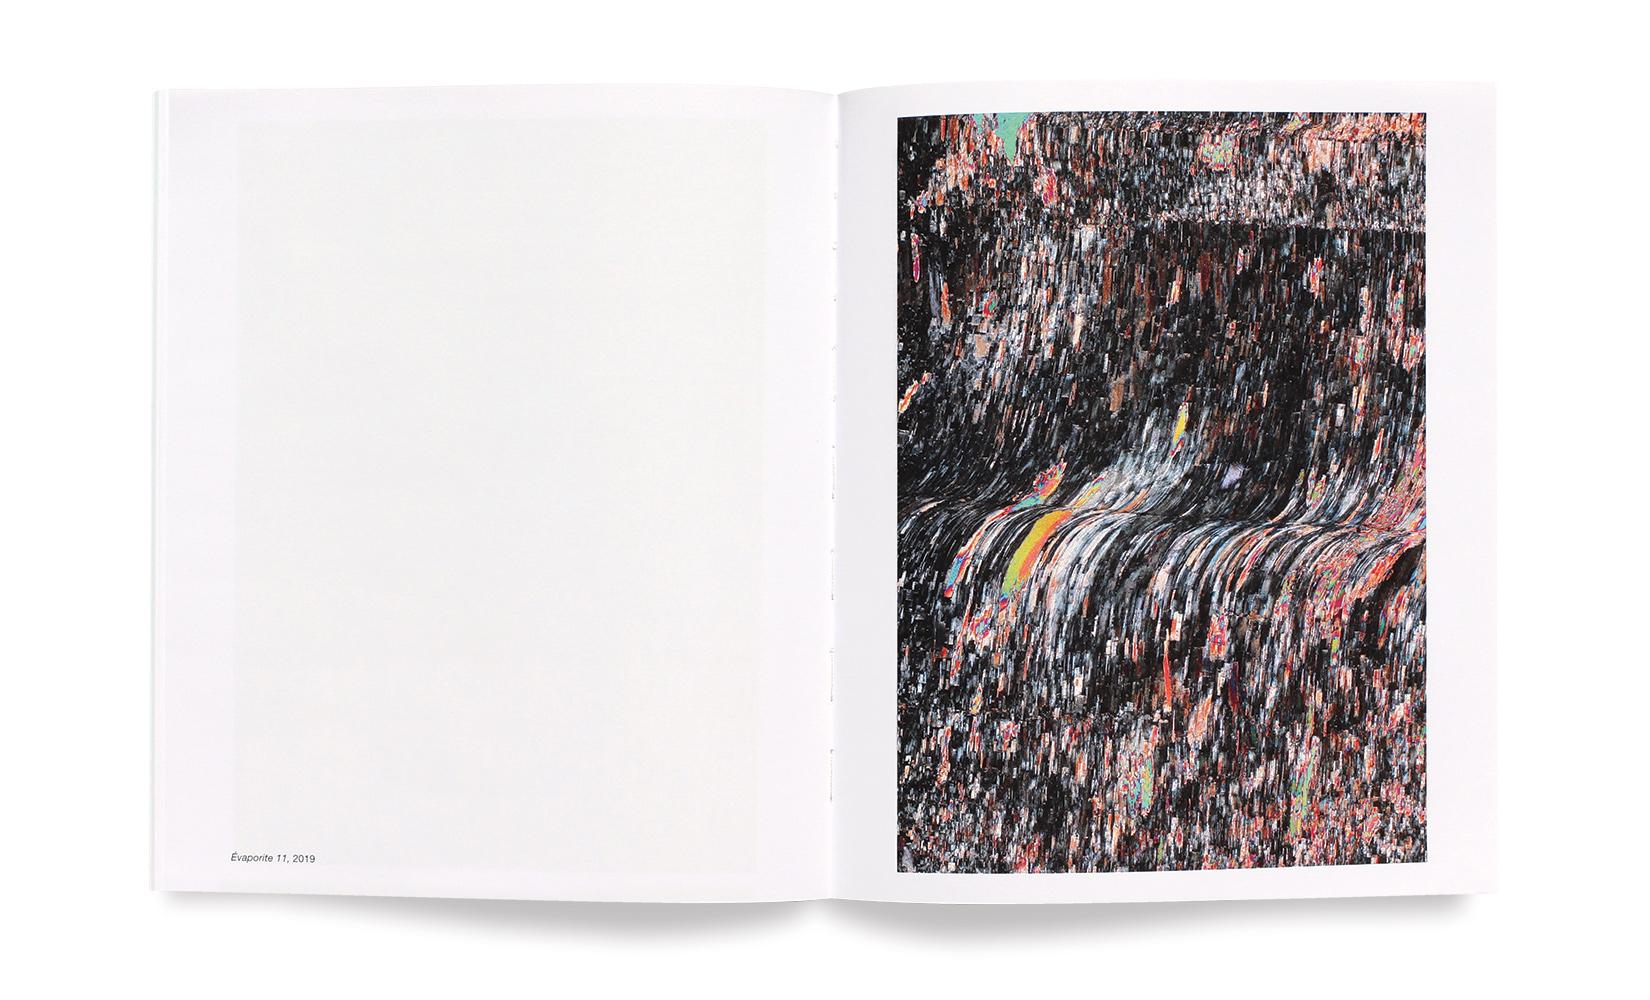 versailles-visible-invisible-toluca-studio-olivier-andreotti-ALLOUCHE-4.jpg